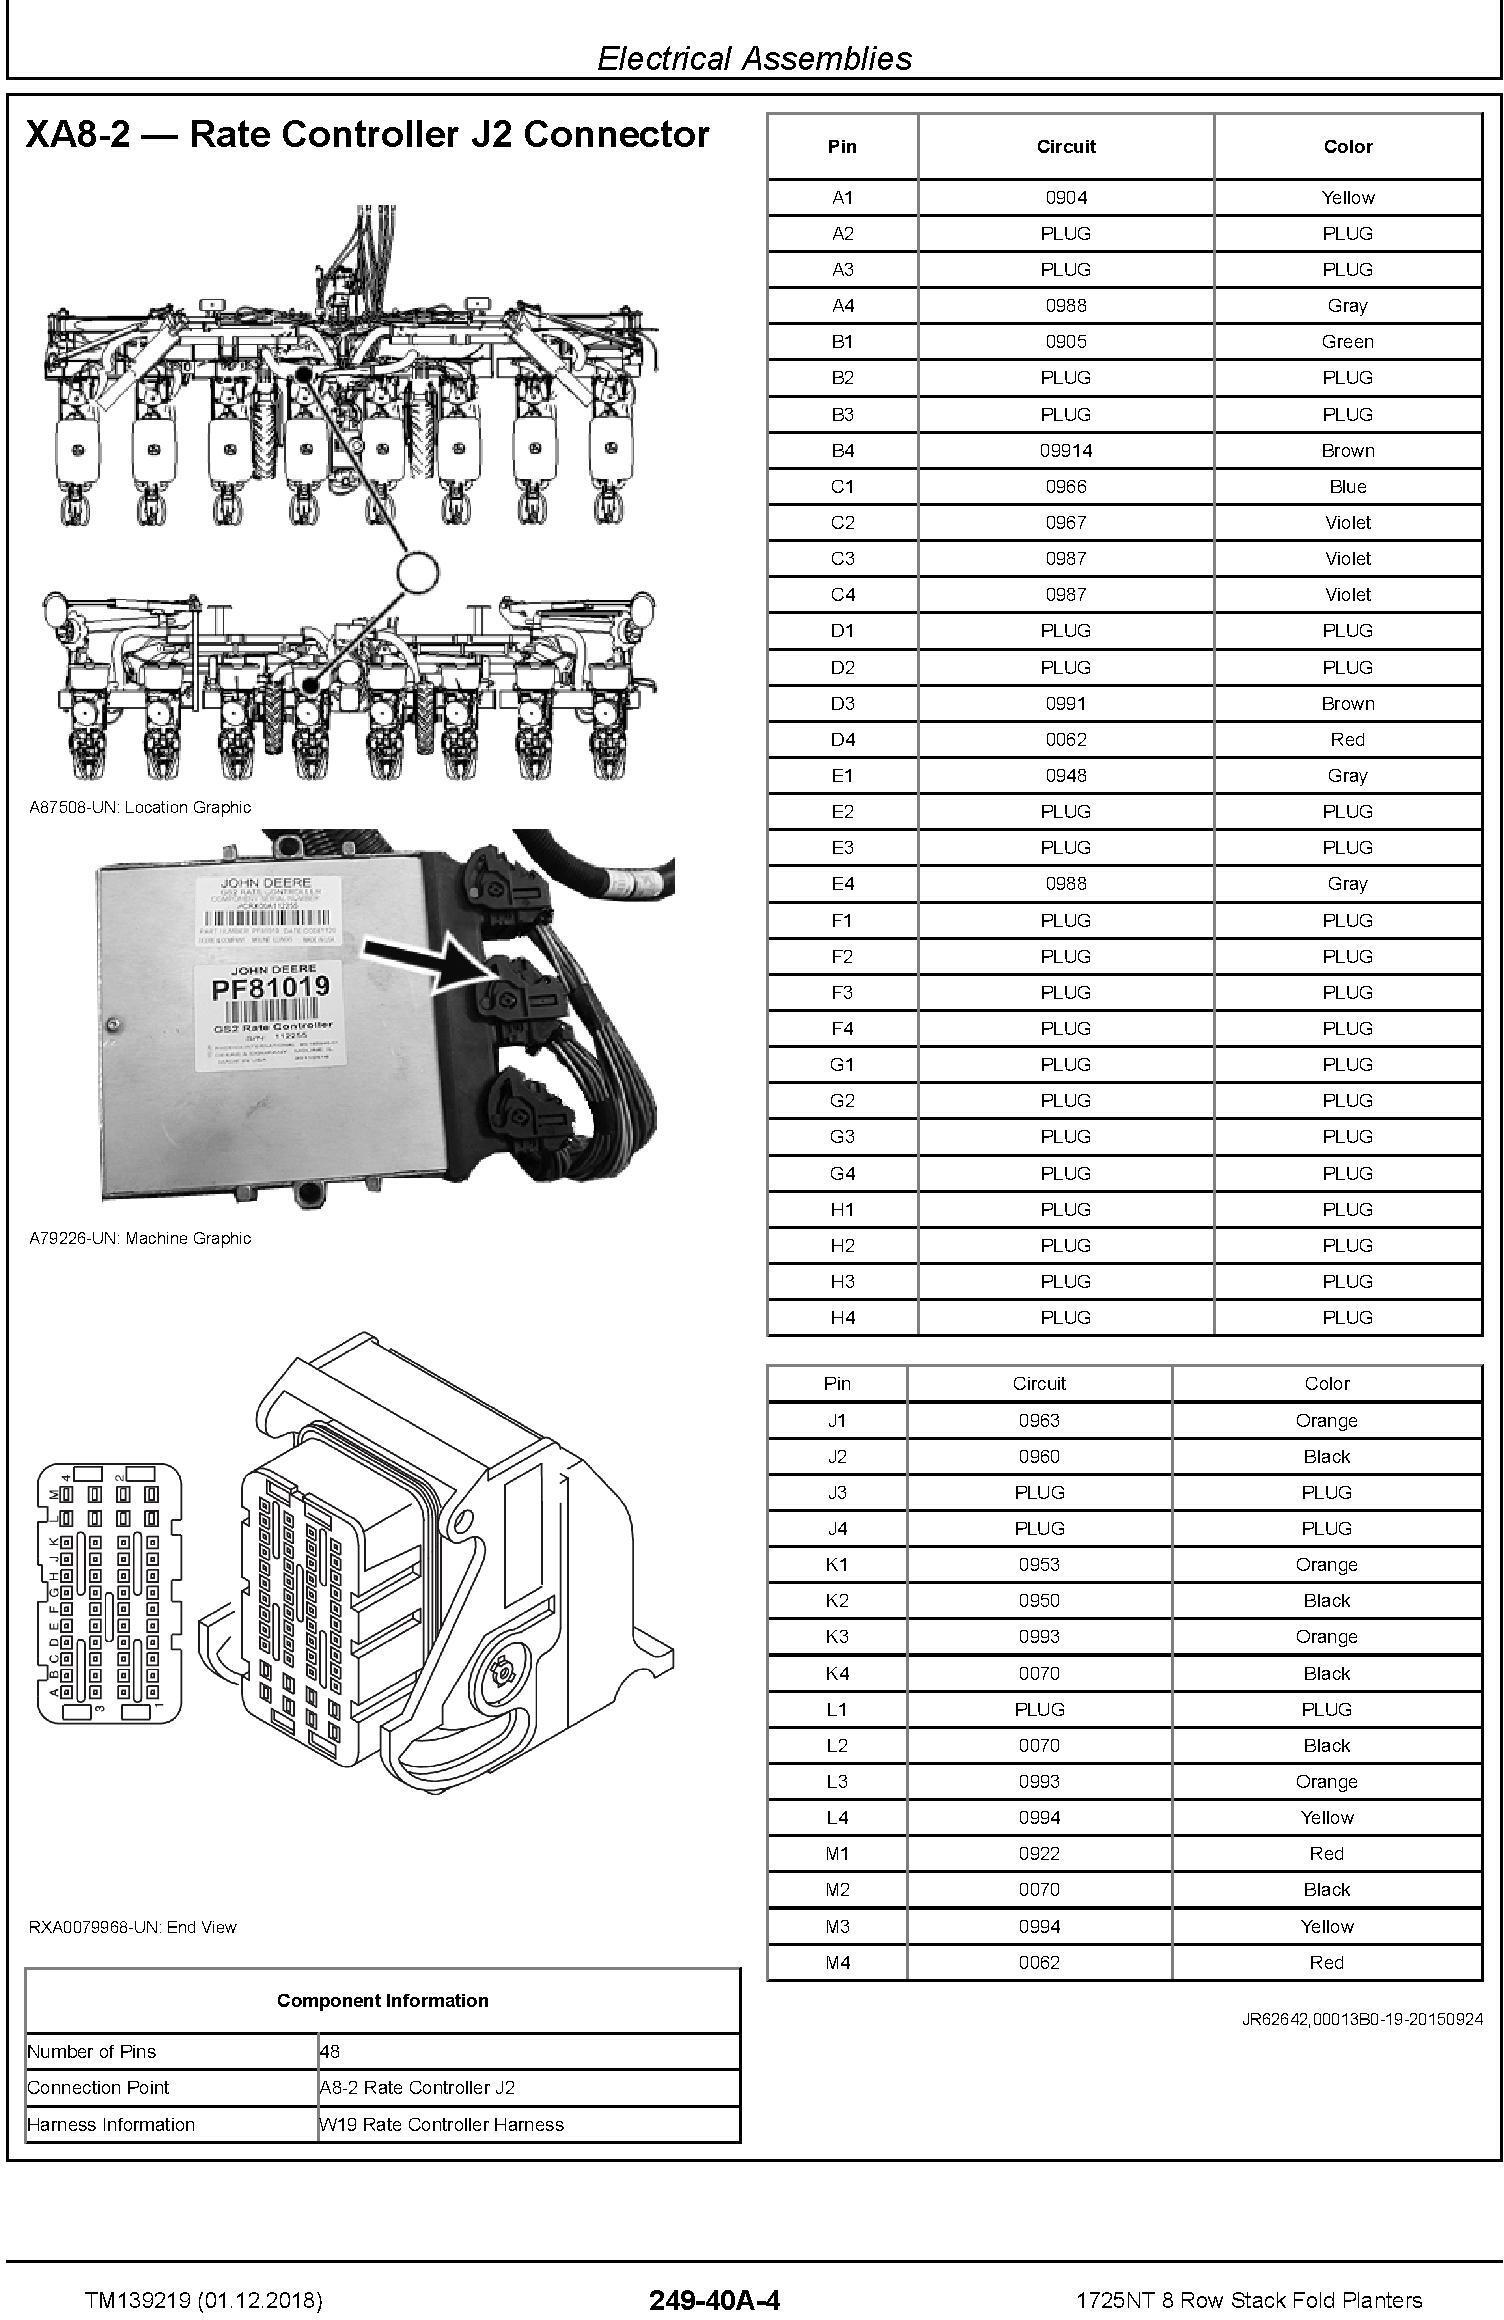 John Deere 1725NT 8 Row Stack Fold Planters Diagnostic Technical Service Manual (TM139219) - 1